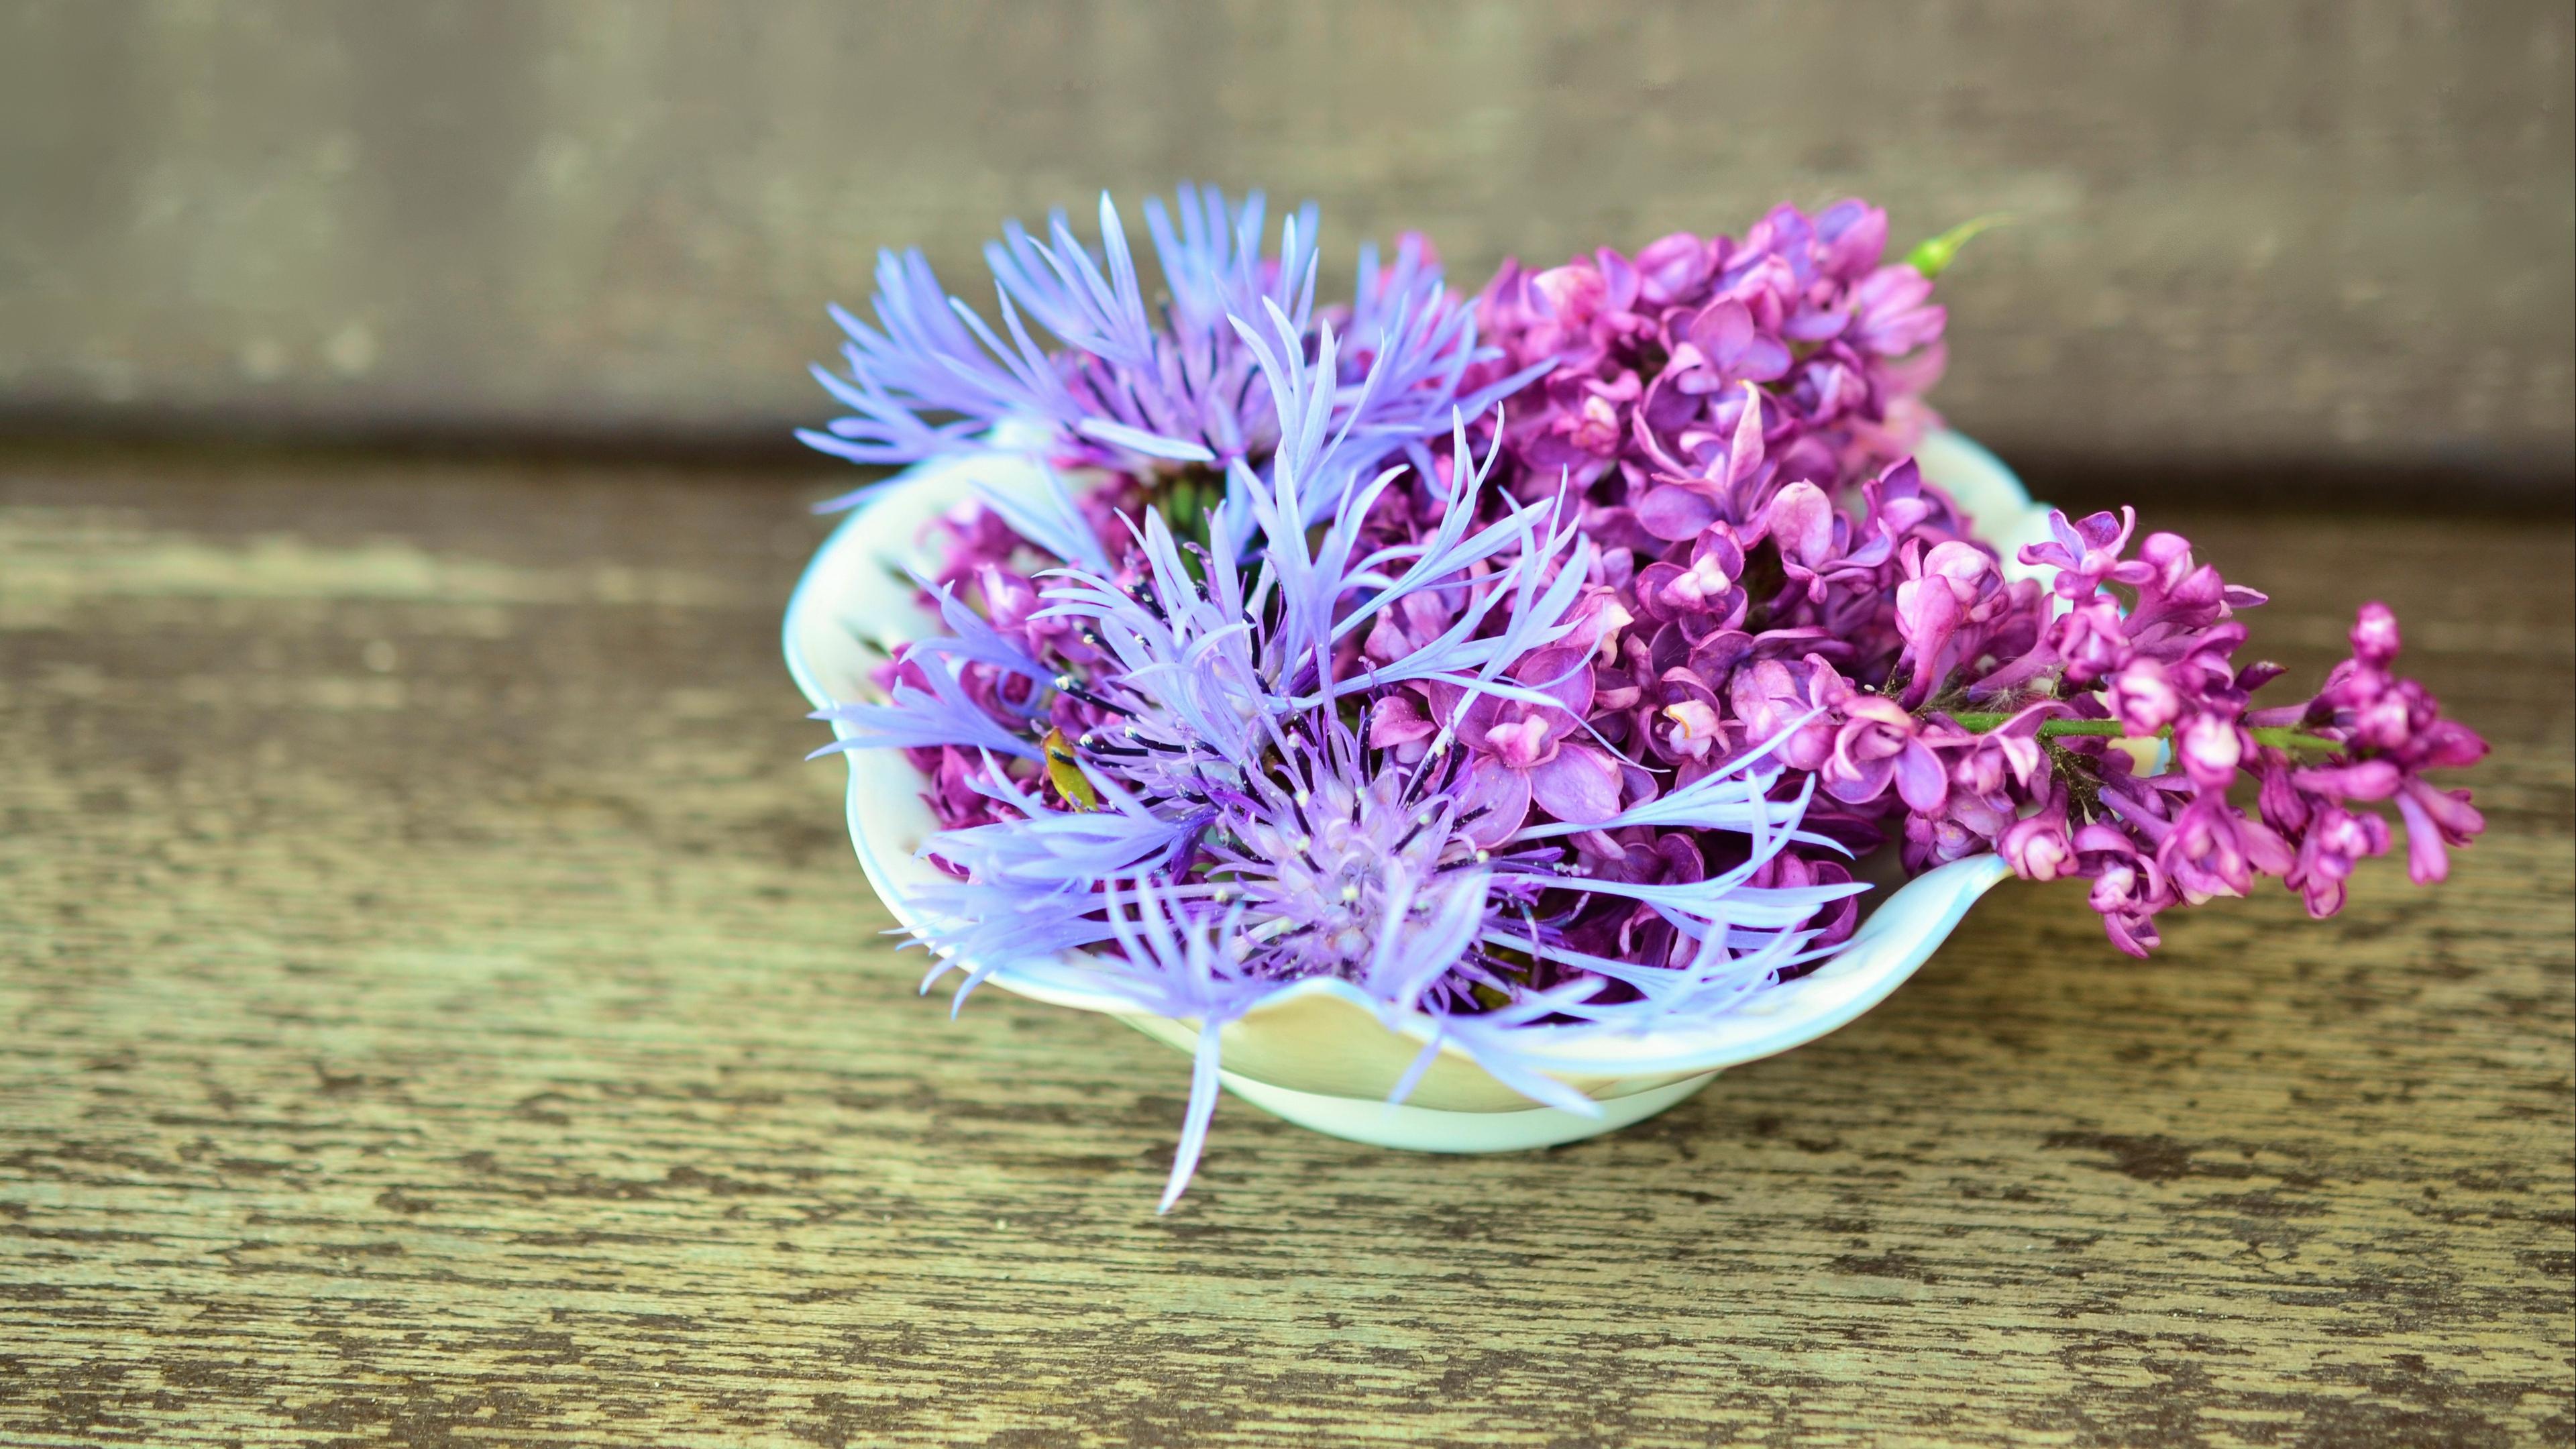 lilac cornflower flowers decoration 4k 1540064793 - lilac, cornflower, flowers, decoration 4k - Lilac, Flowers, cornflower